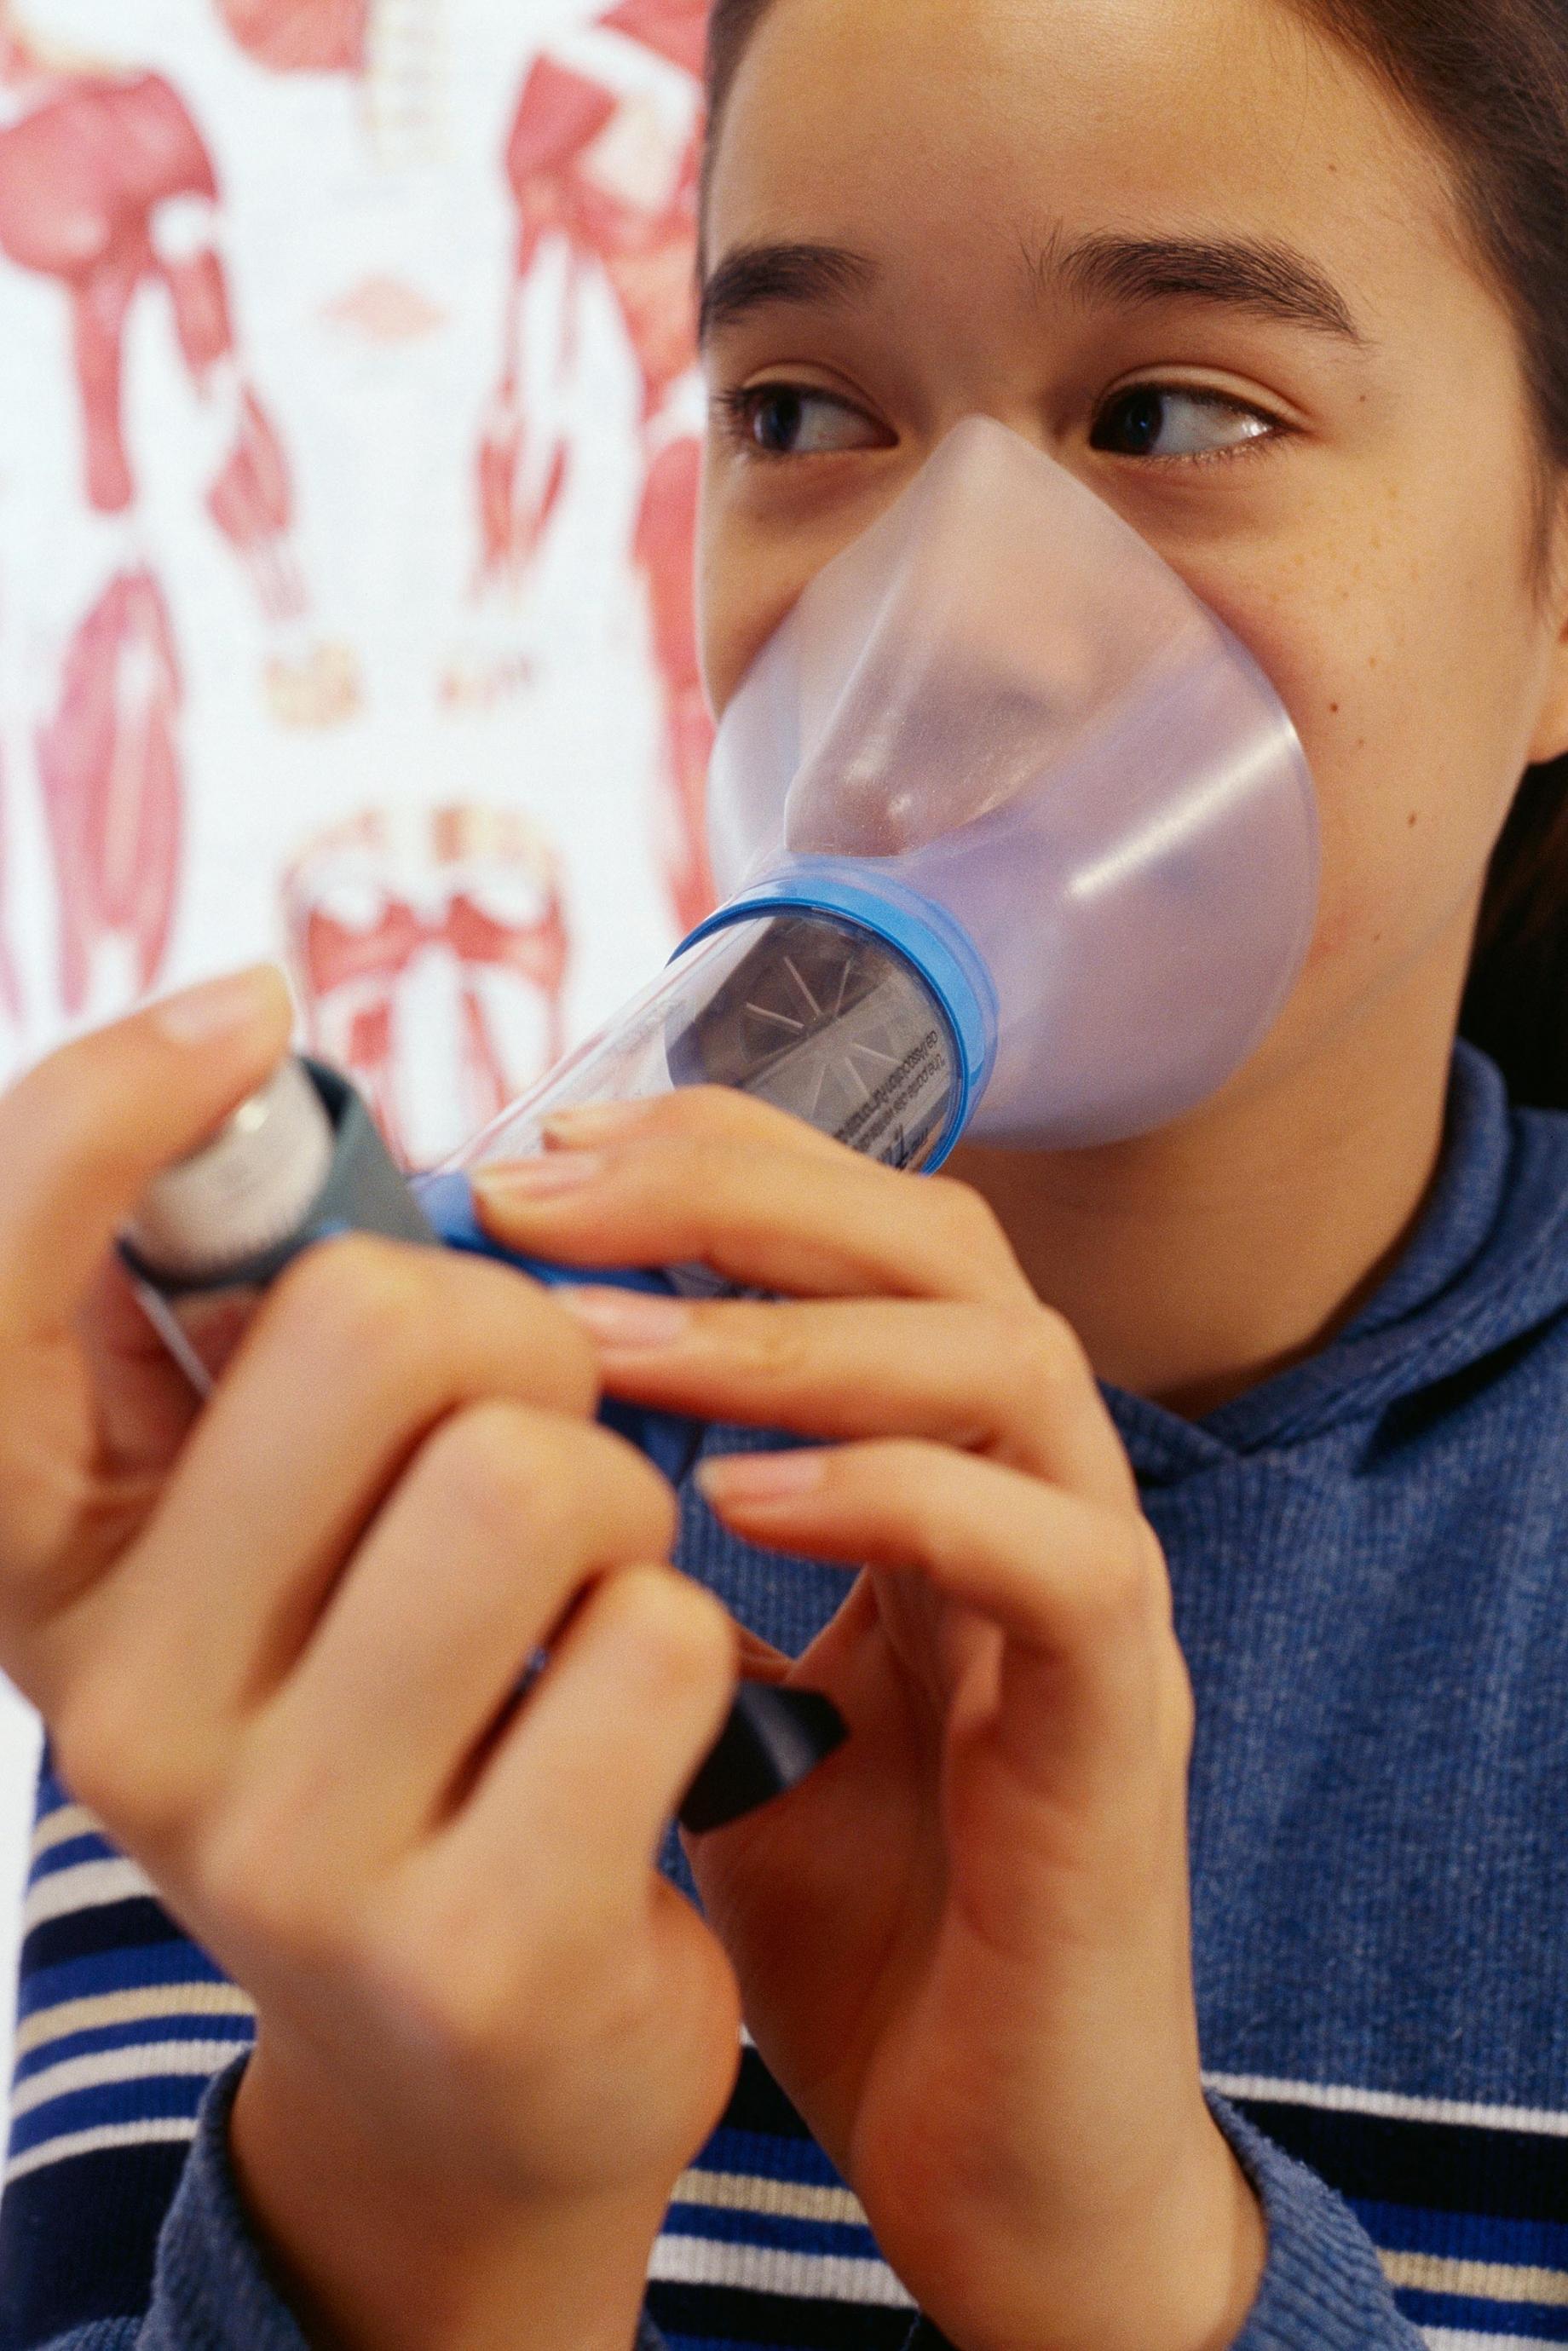 Girl su ering from asthma